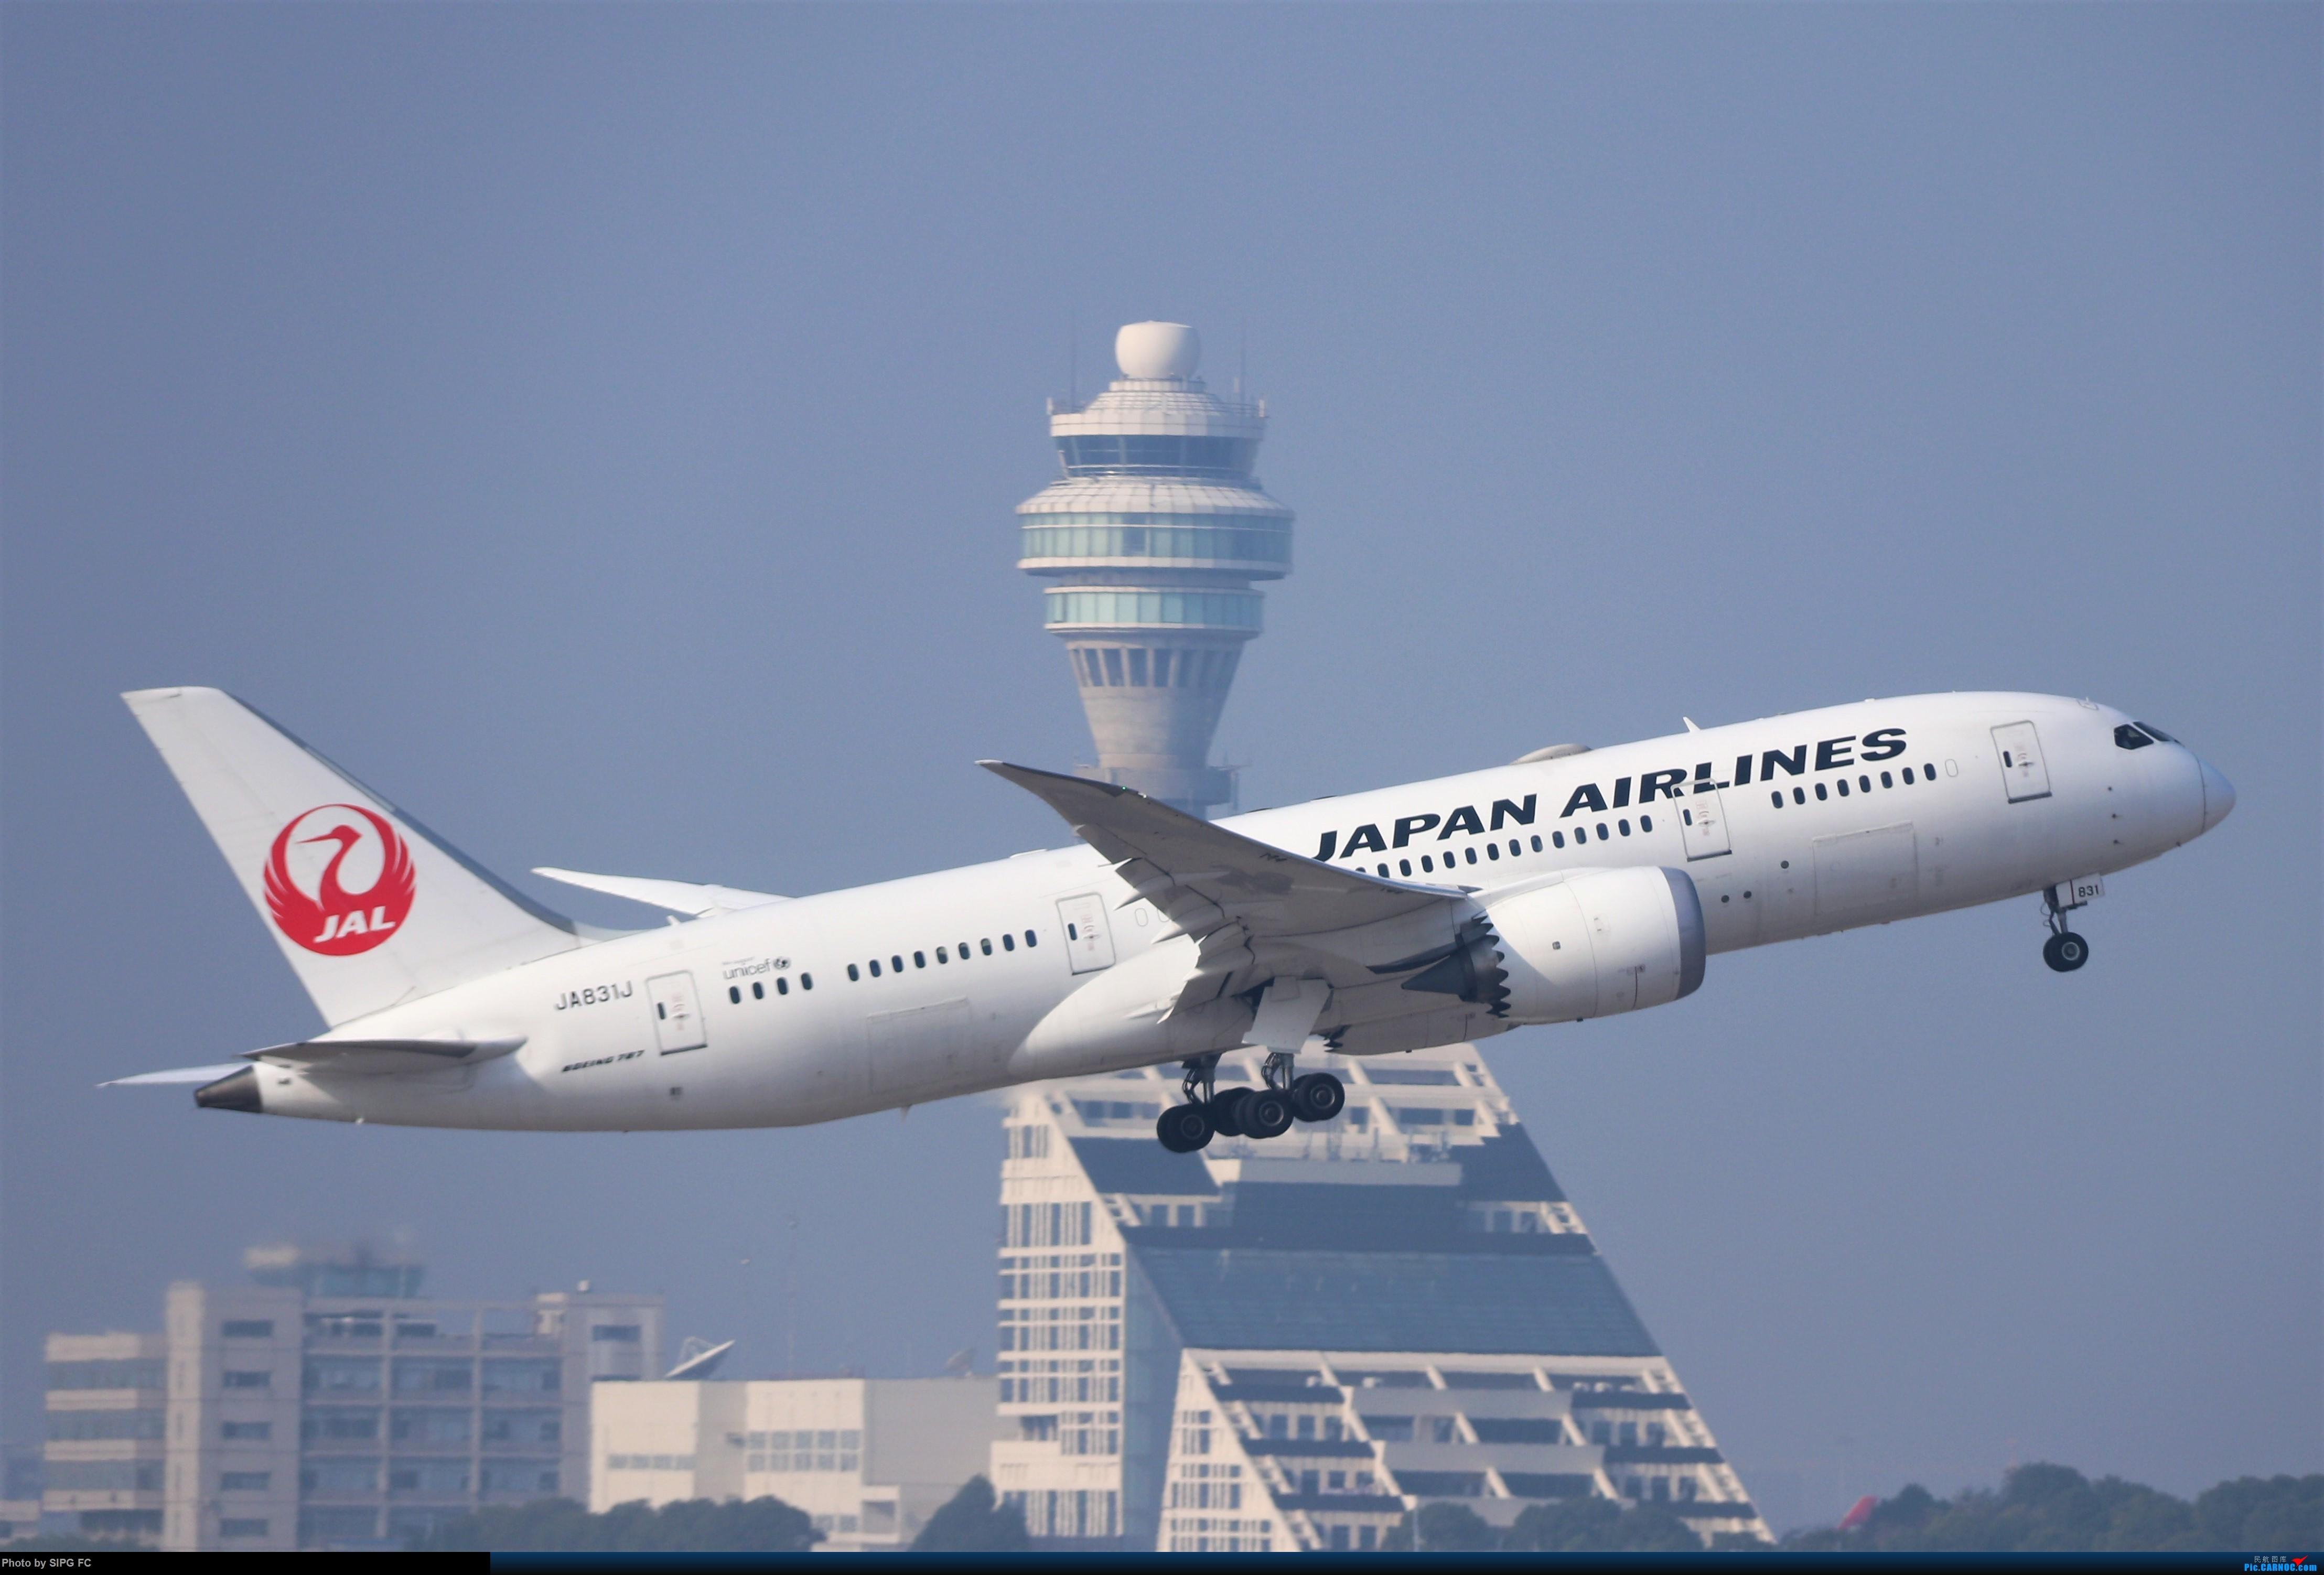 Re:[原创]清晨浓雾散去后繁忙的浦东机场 BOEING 787 JA-831J 中国上海浦东国际机场